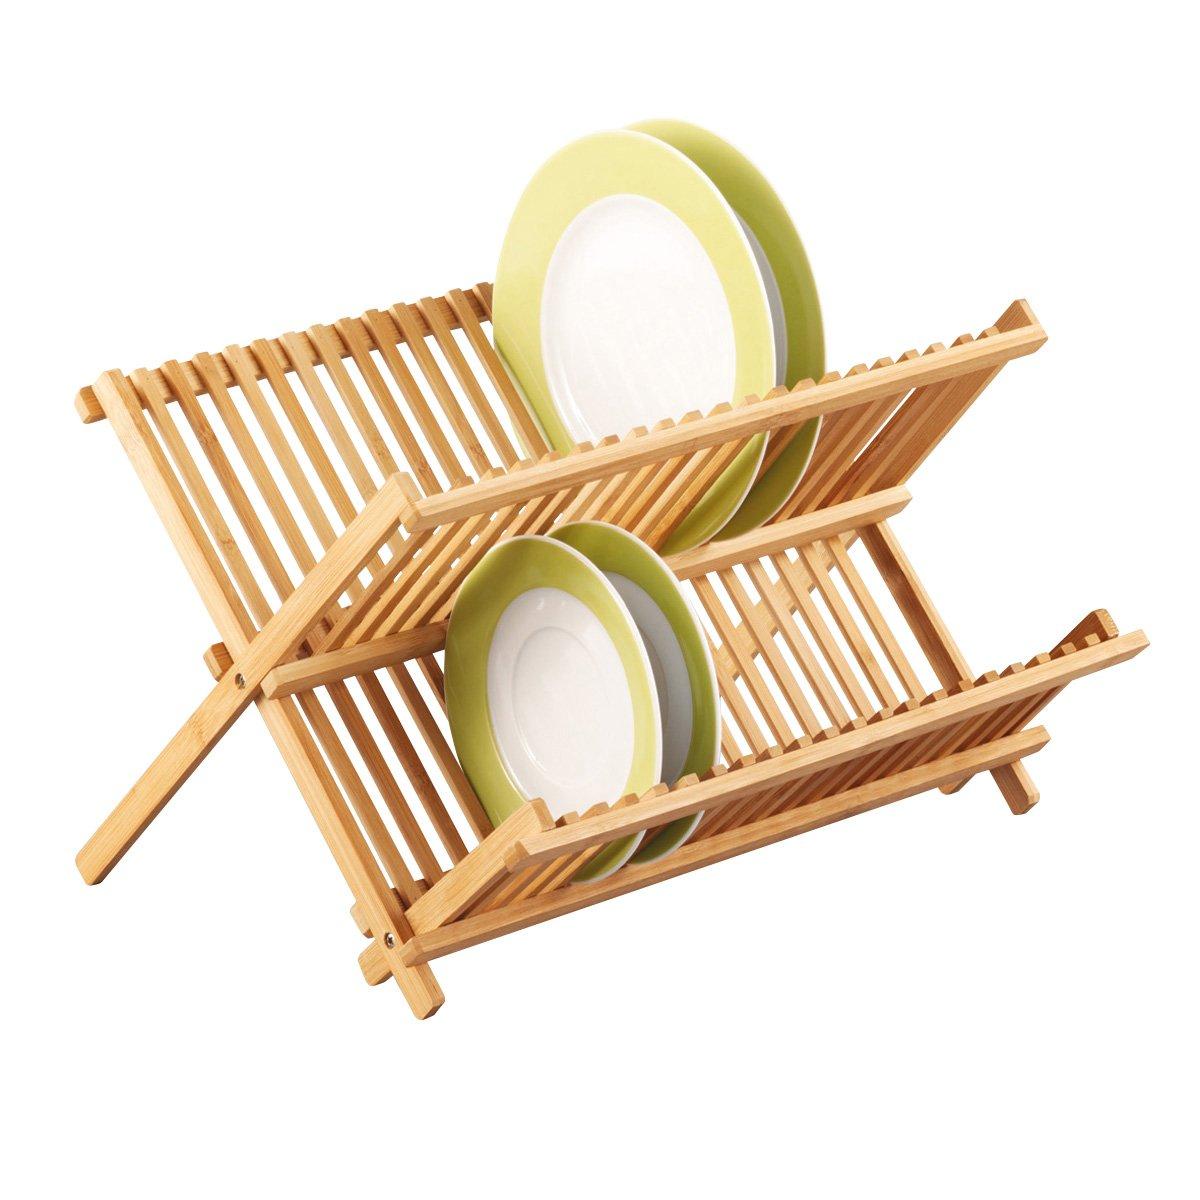 Zeller 25341 Scolapiatti in bambù, 42 x 35 x 27.5 cm Zeller Present Handels GmbH